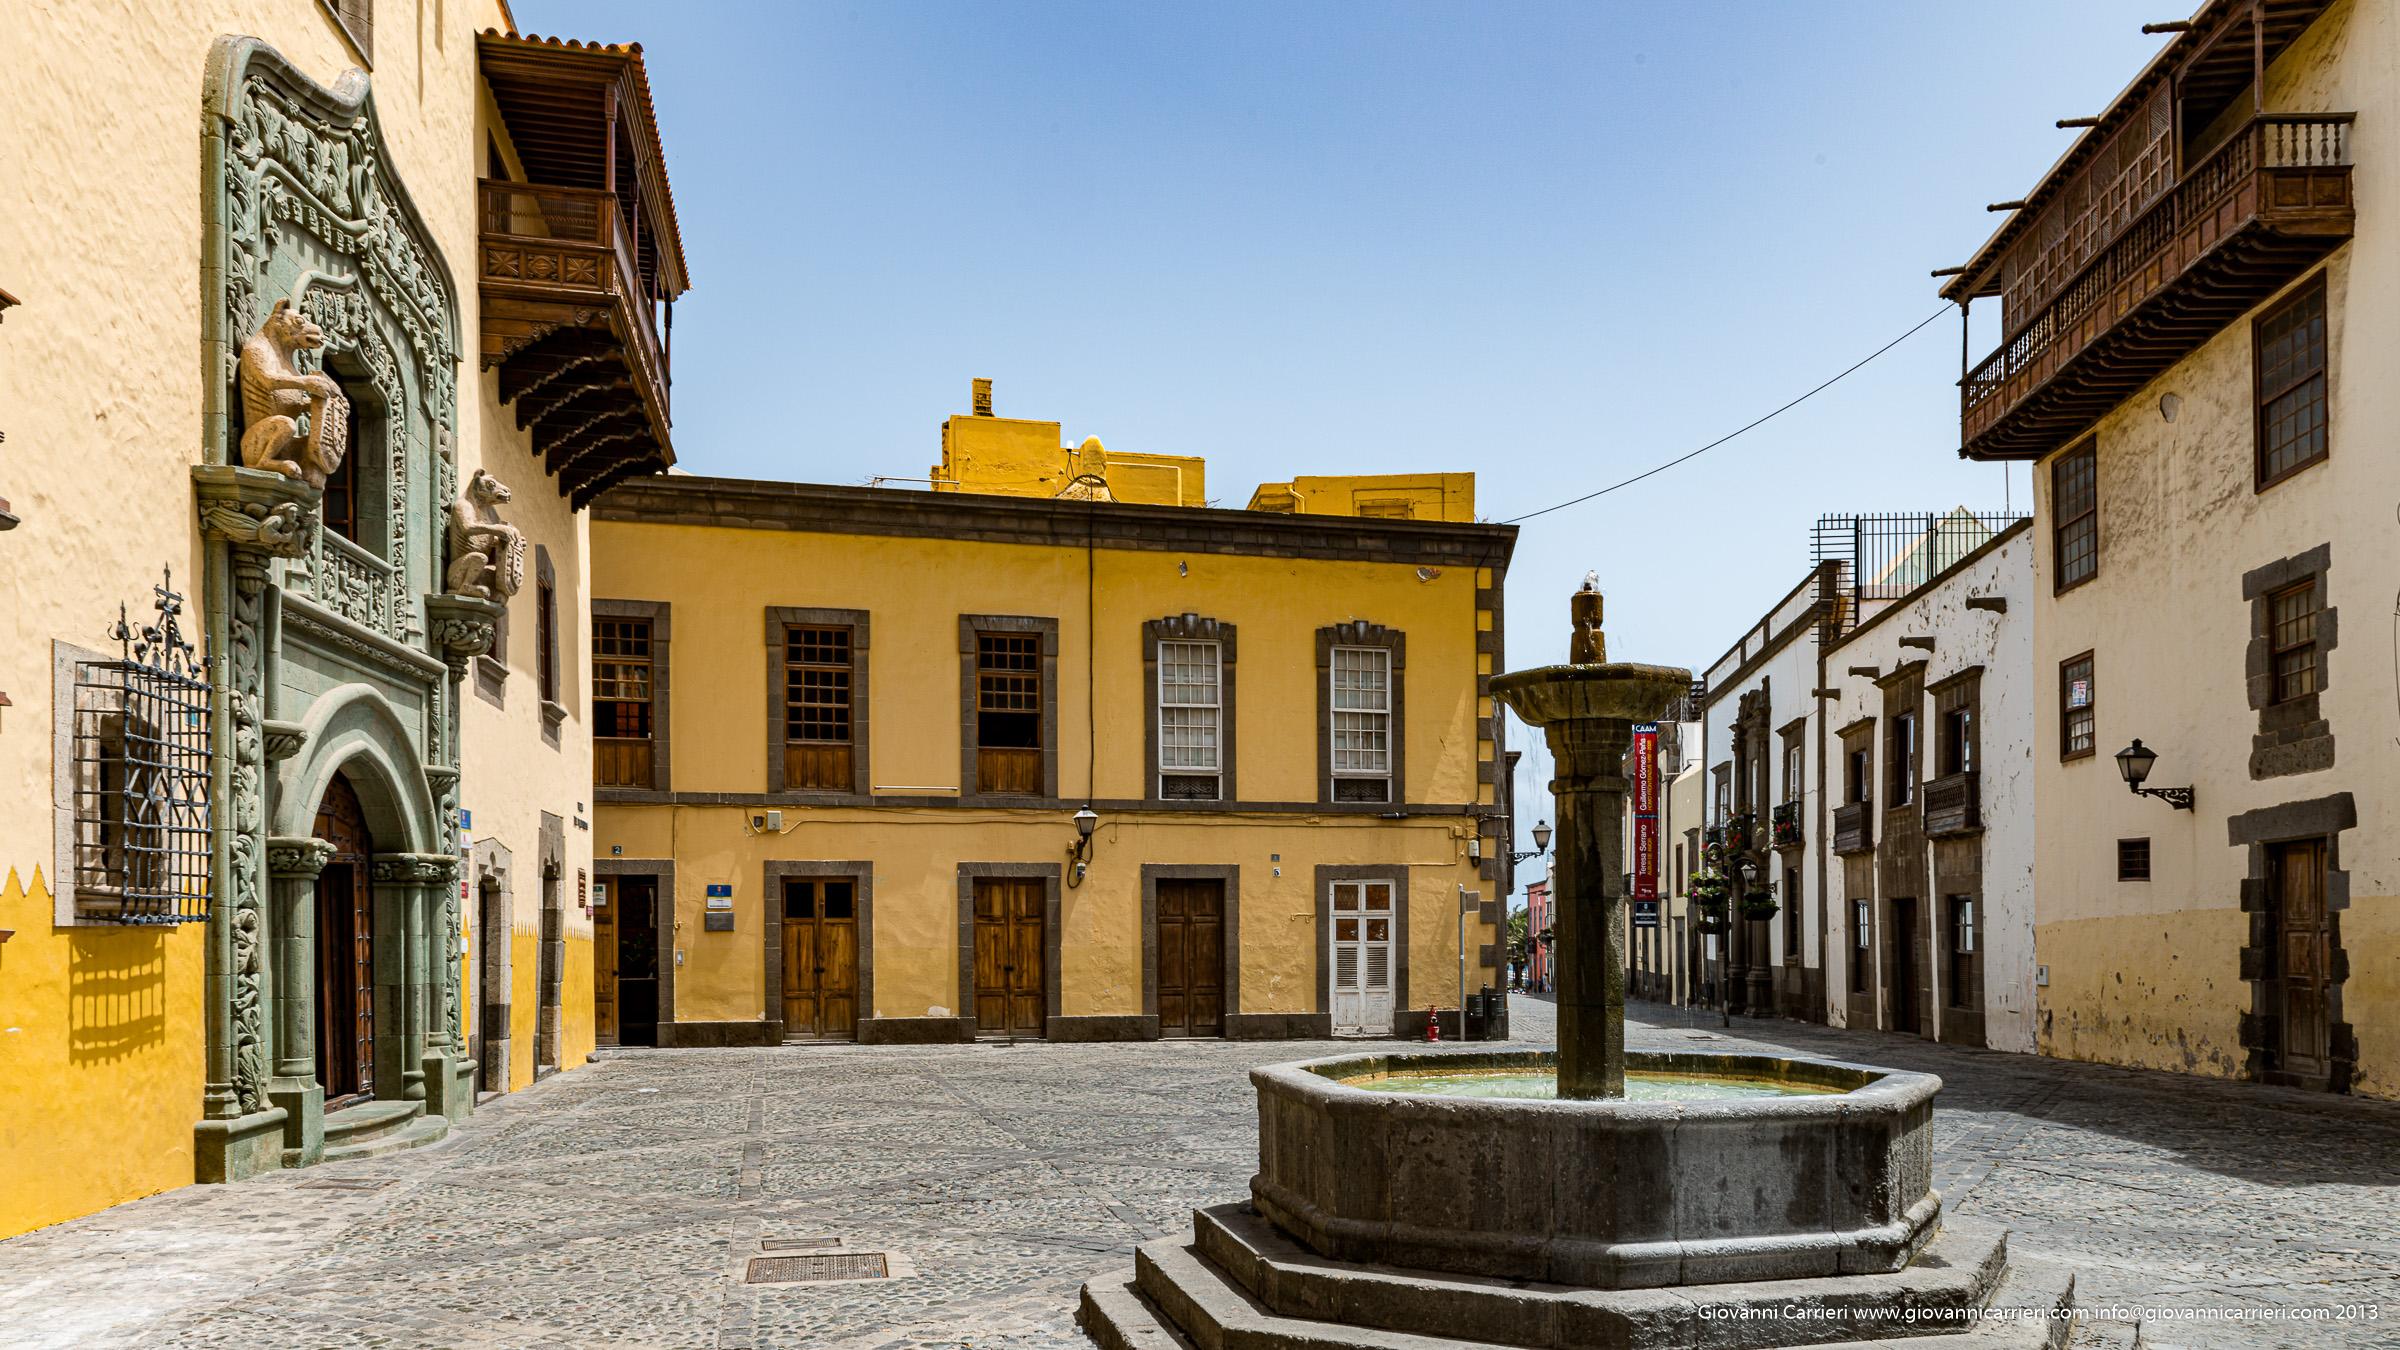 Square of the Cristoforo Colombo home